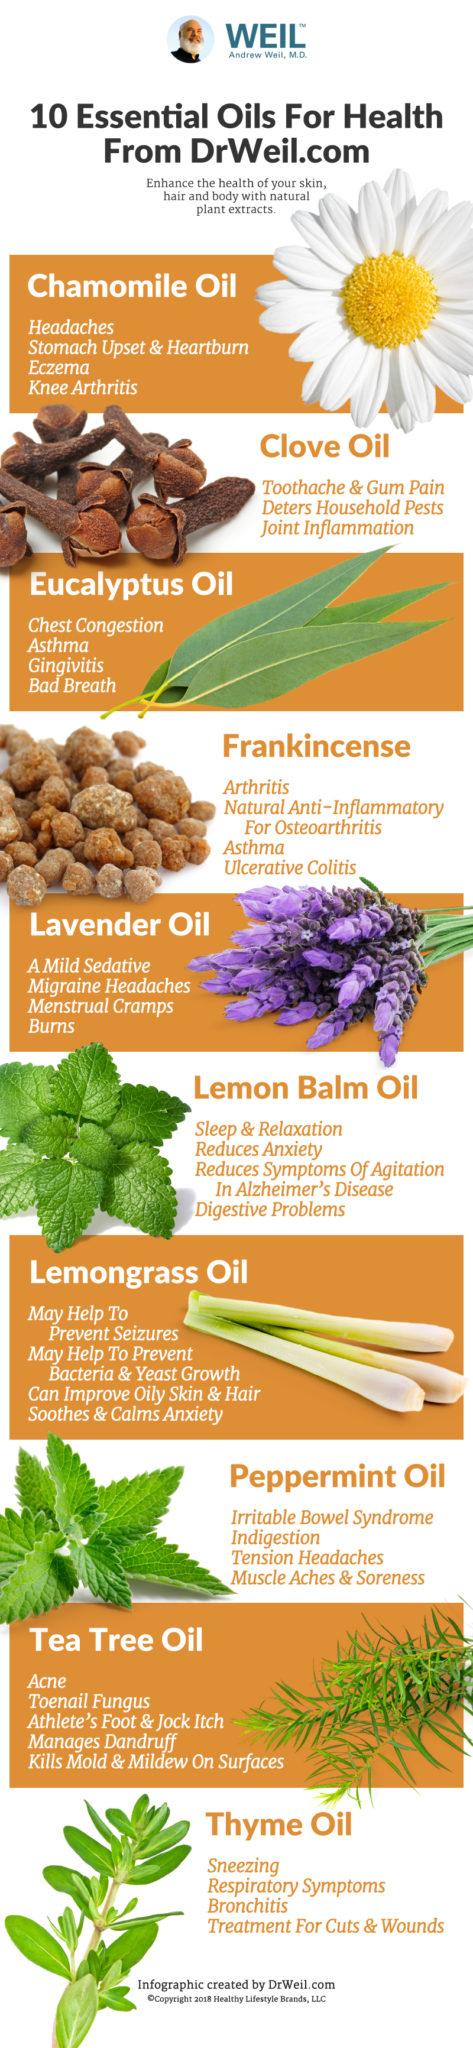 8 Vitamin Bs From DrWeil.com